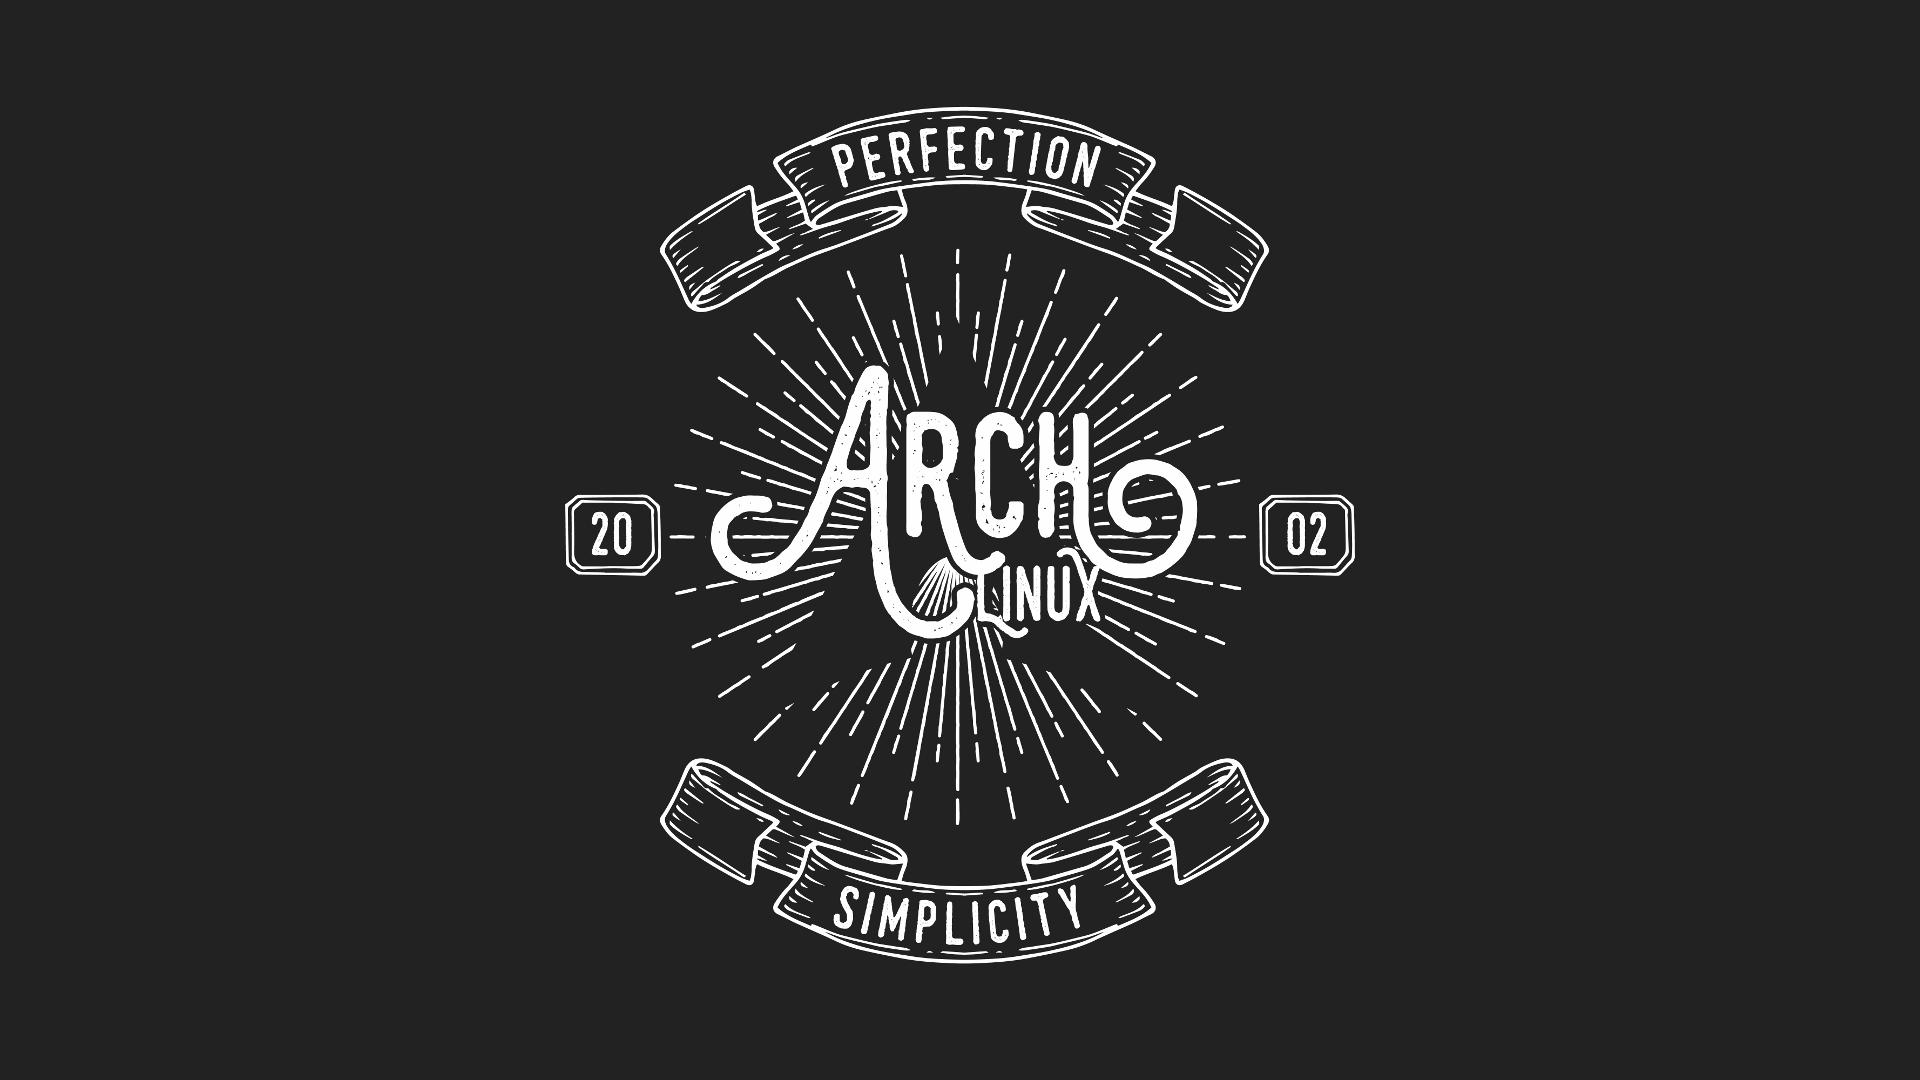 General 1920x1080 Archlinux Linux simple background black background dark gray